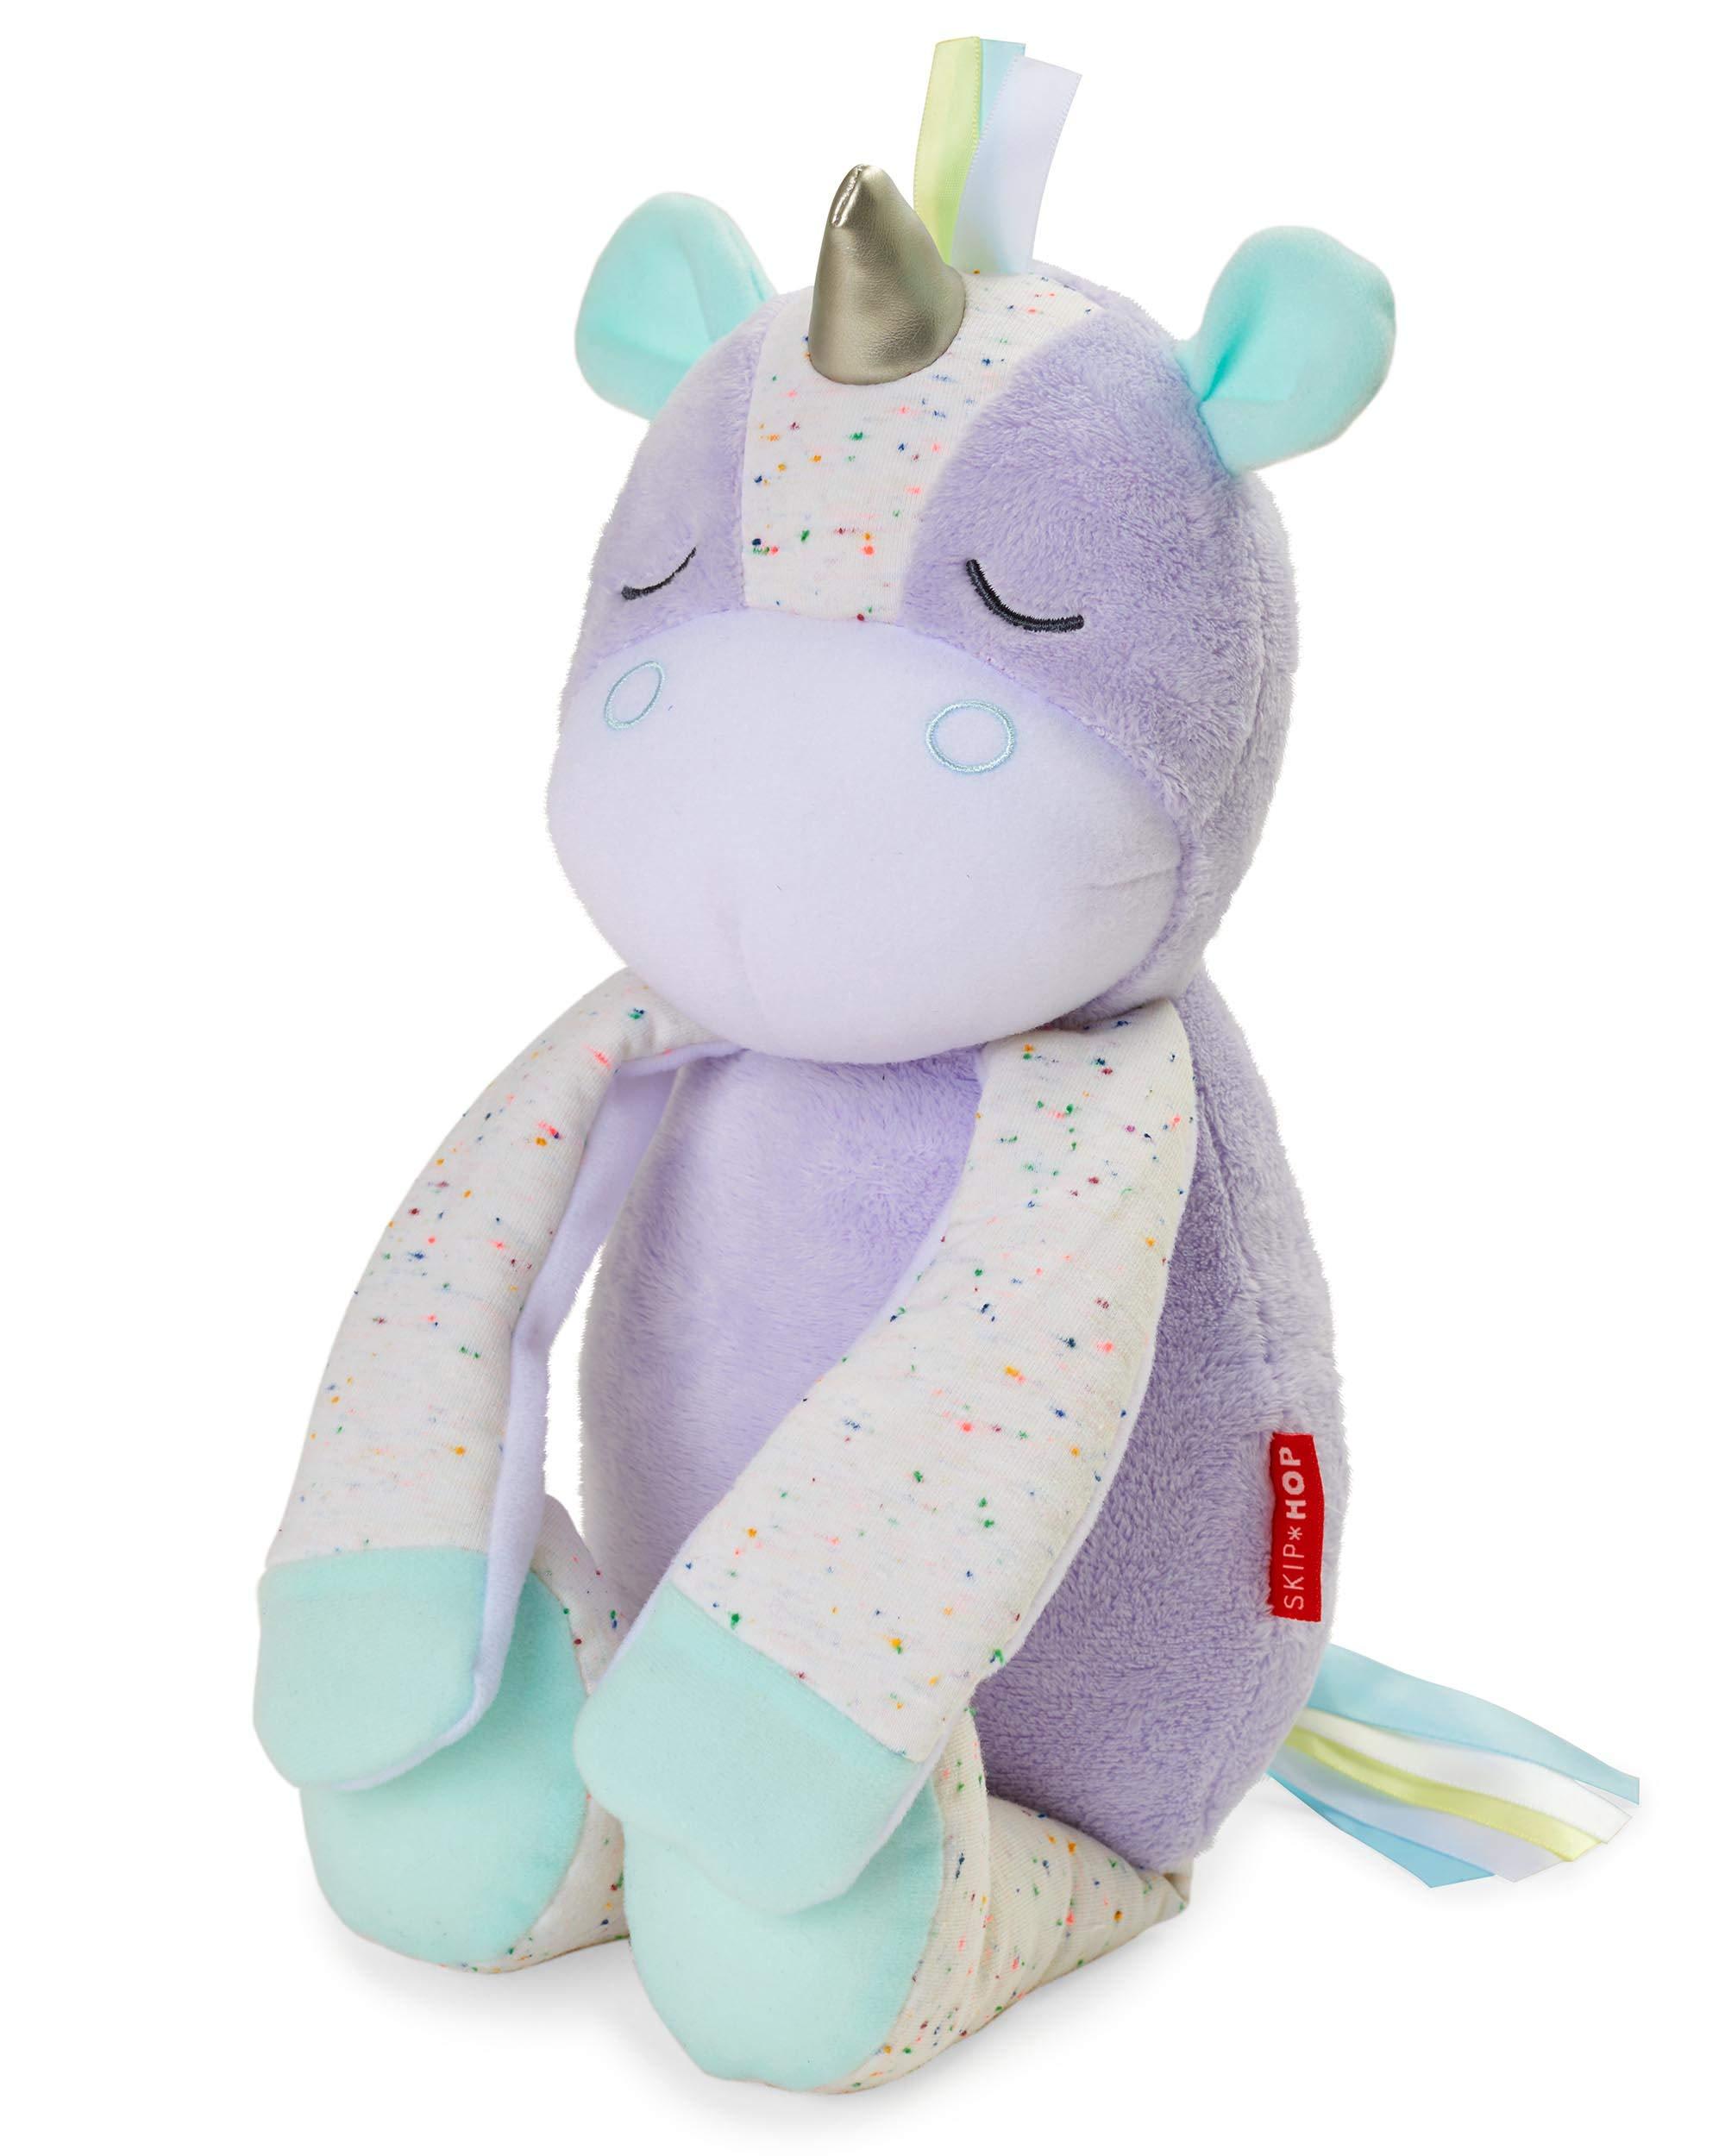 Skip Hop Cry-Activated Baby Sleep Soother & Nursery Sound Machine - Plush Unicorn